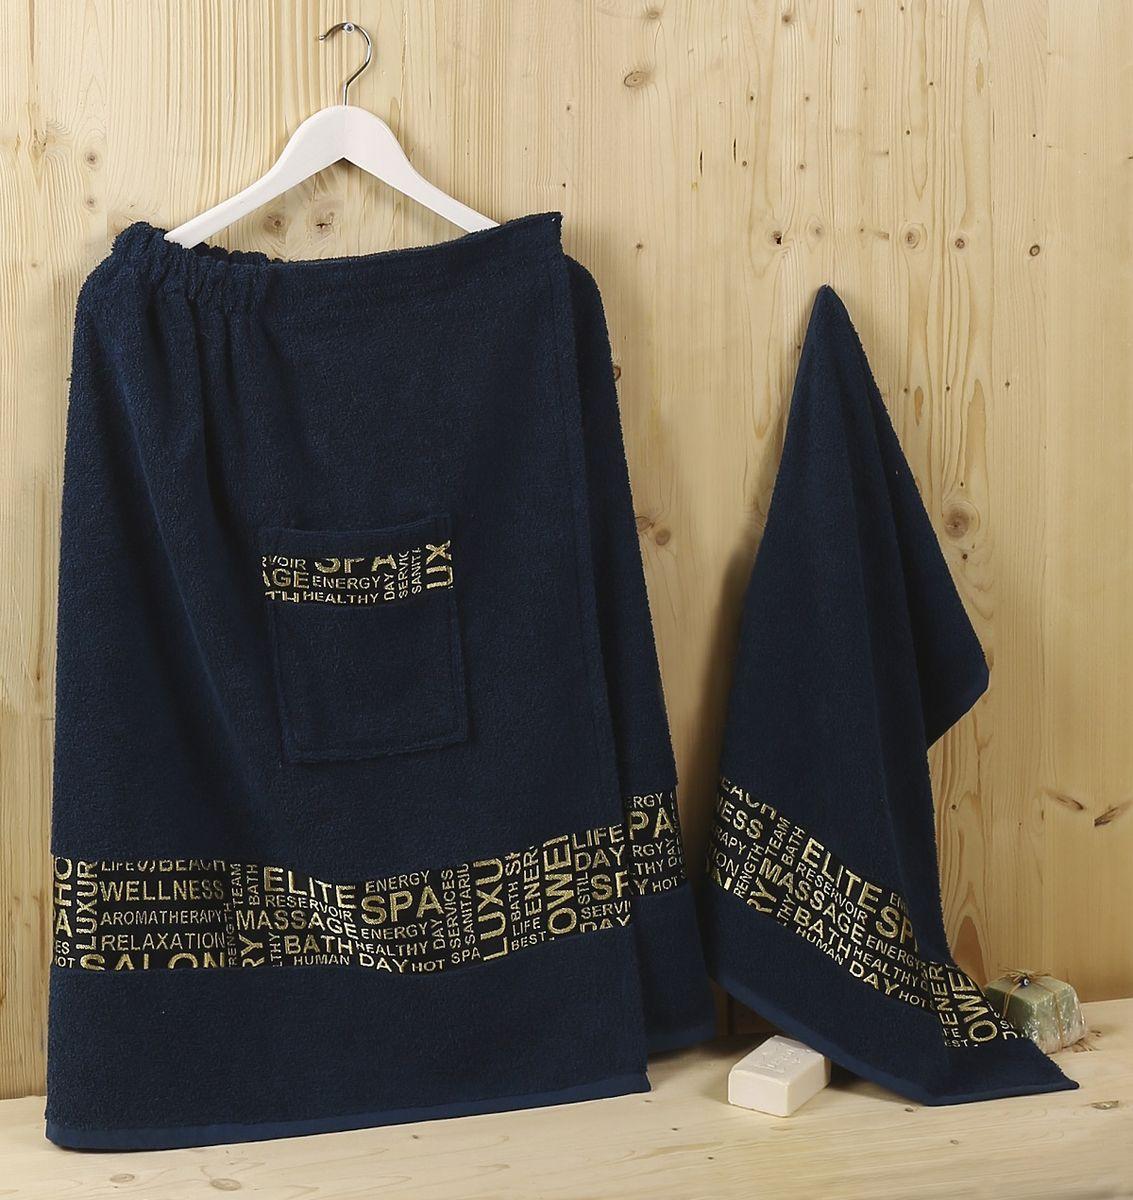 Набор для сауны Karna  Relax , цвет: синий, 2 предмета - Баня, сауна